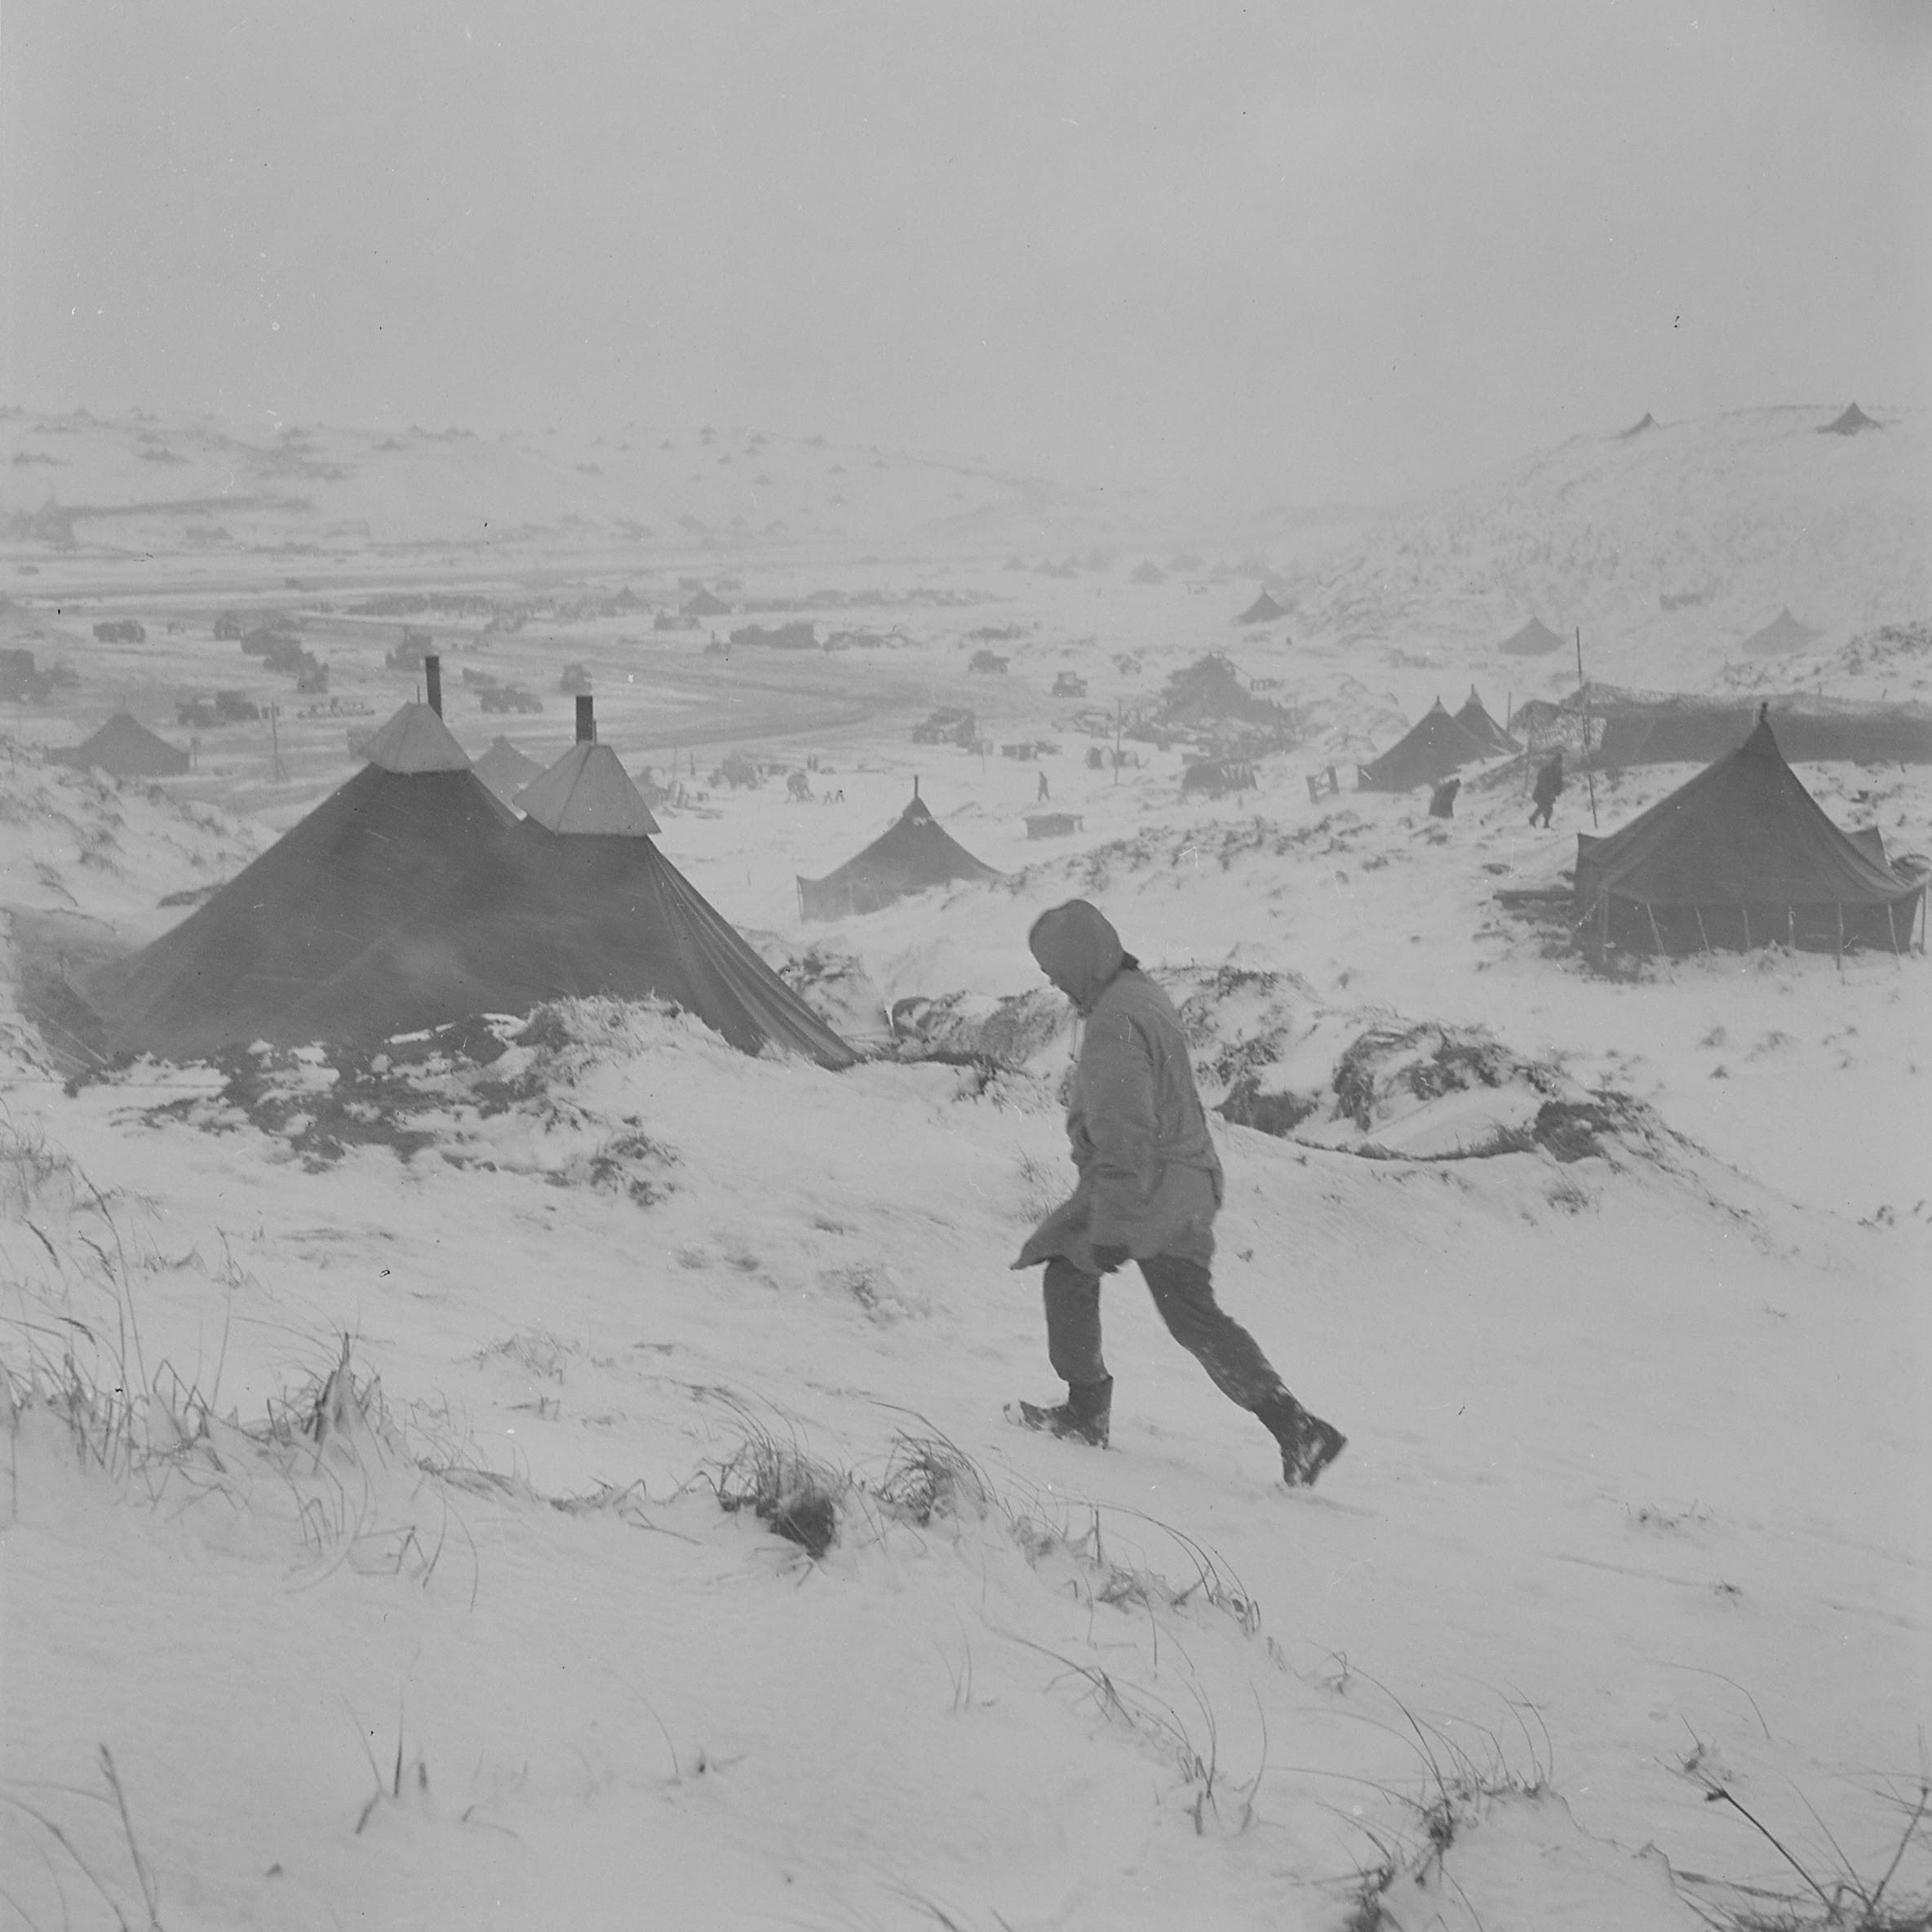 http://upload.wikimedia.org/wikipedia/commons/4/43/Aleutian_air_base_during_blizzard_-_NARA_-_520978.jpg